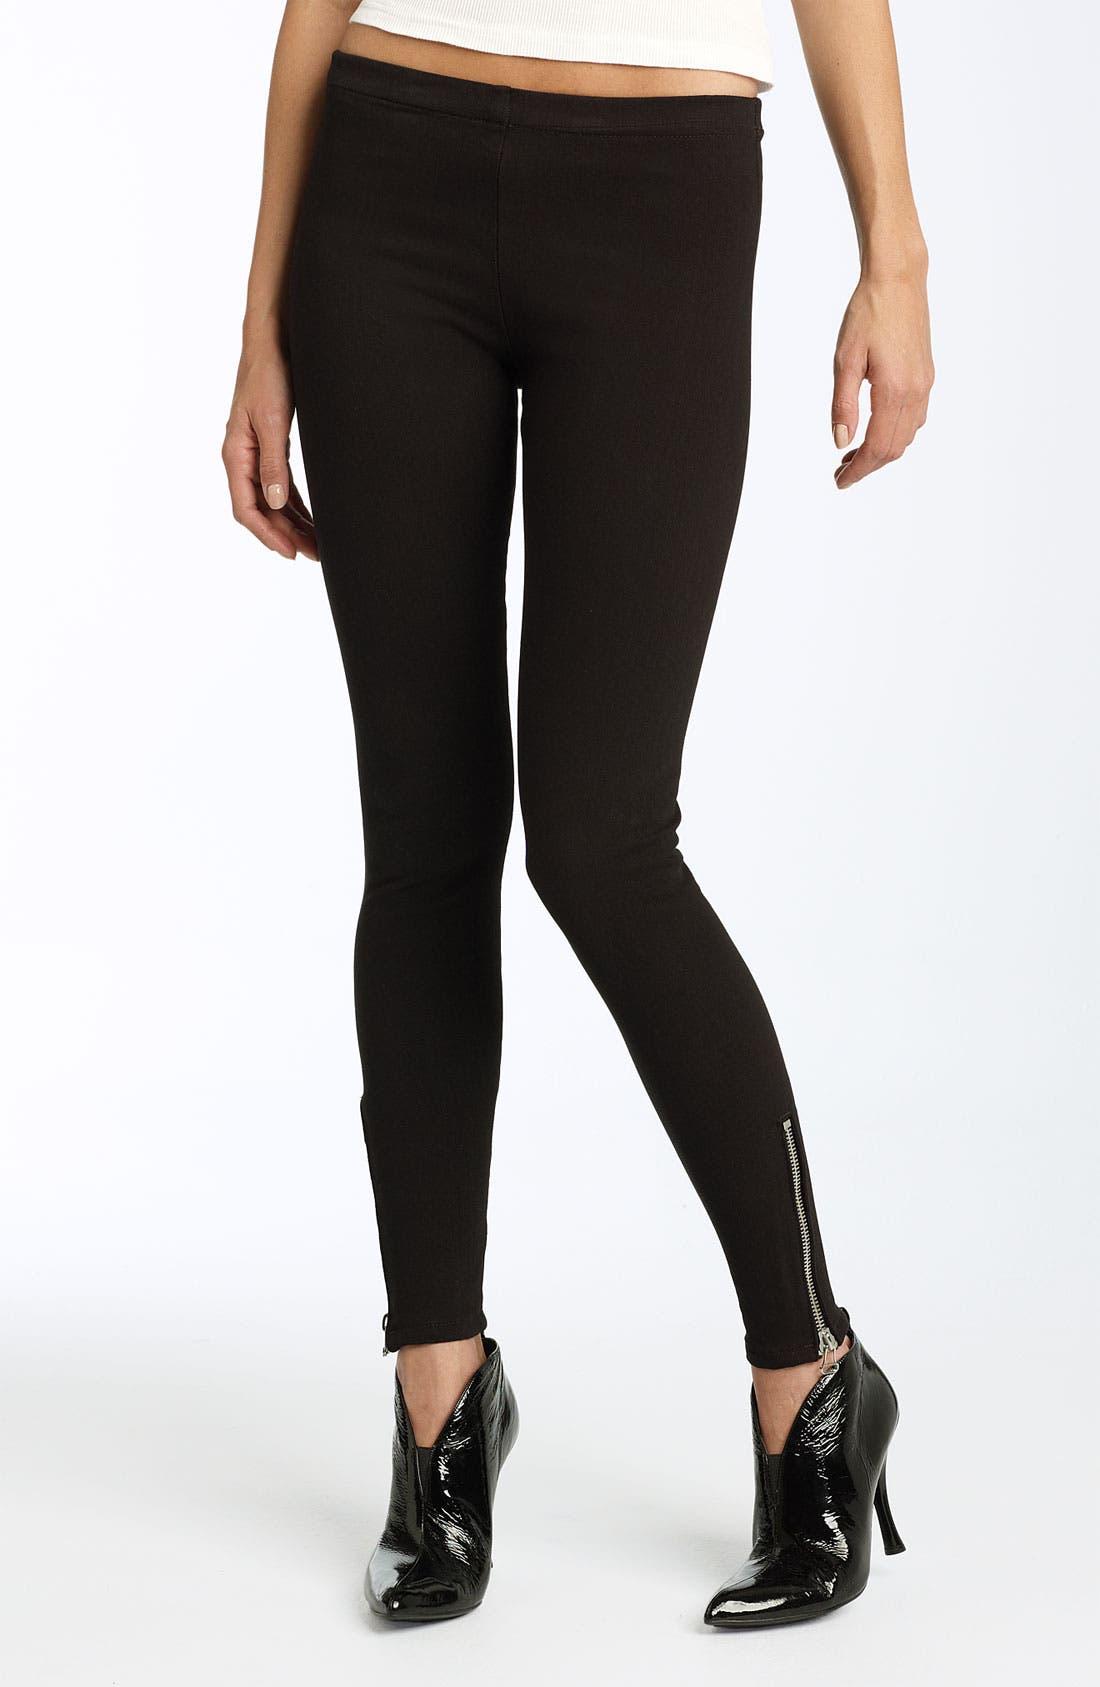 Alternate Image 1 Selected - Joe's Jeans Side Zip Hem Stretch Denim Leggings (Black Wash)